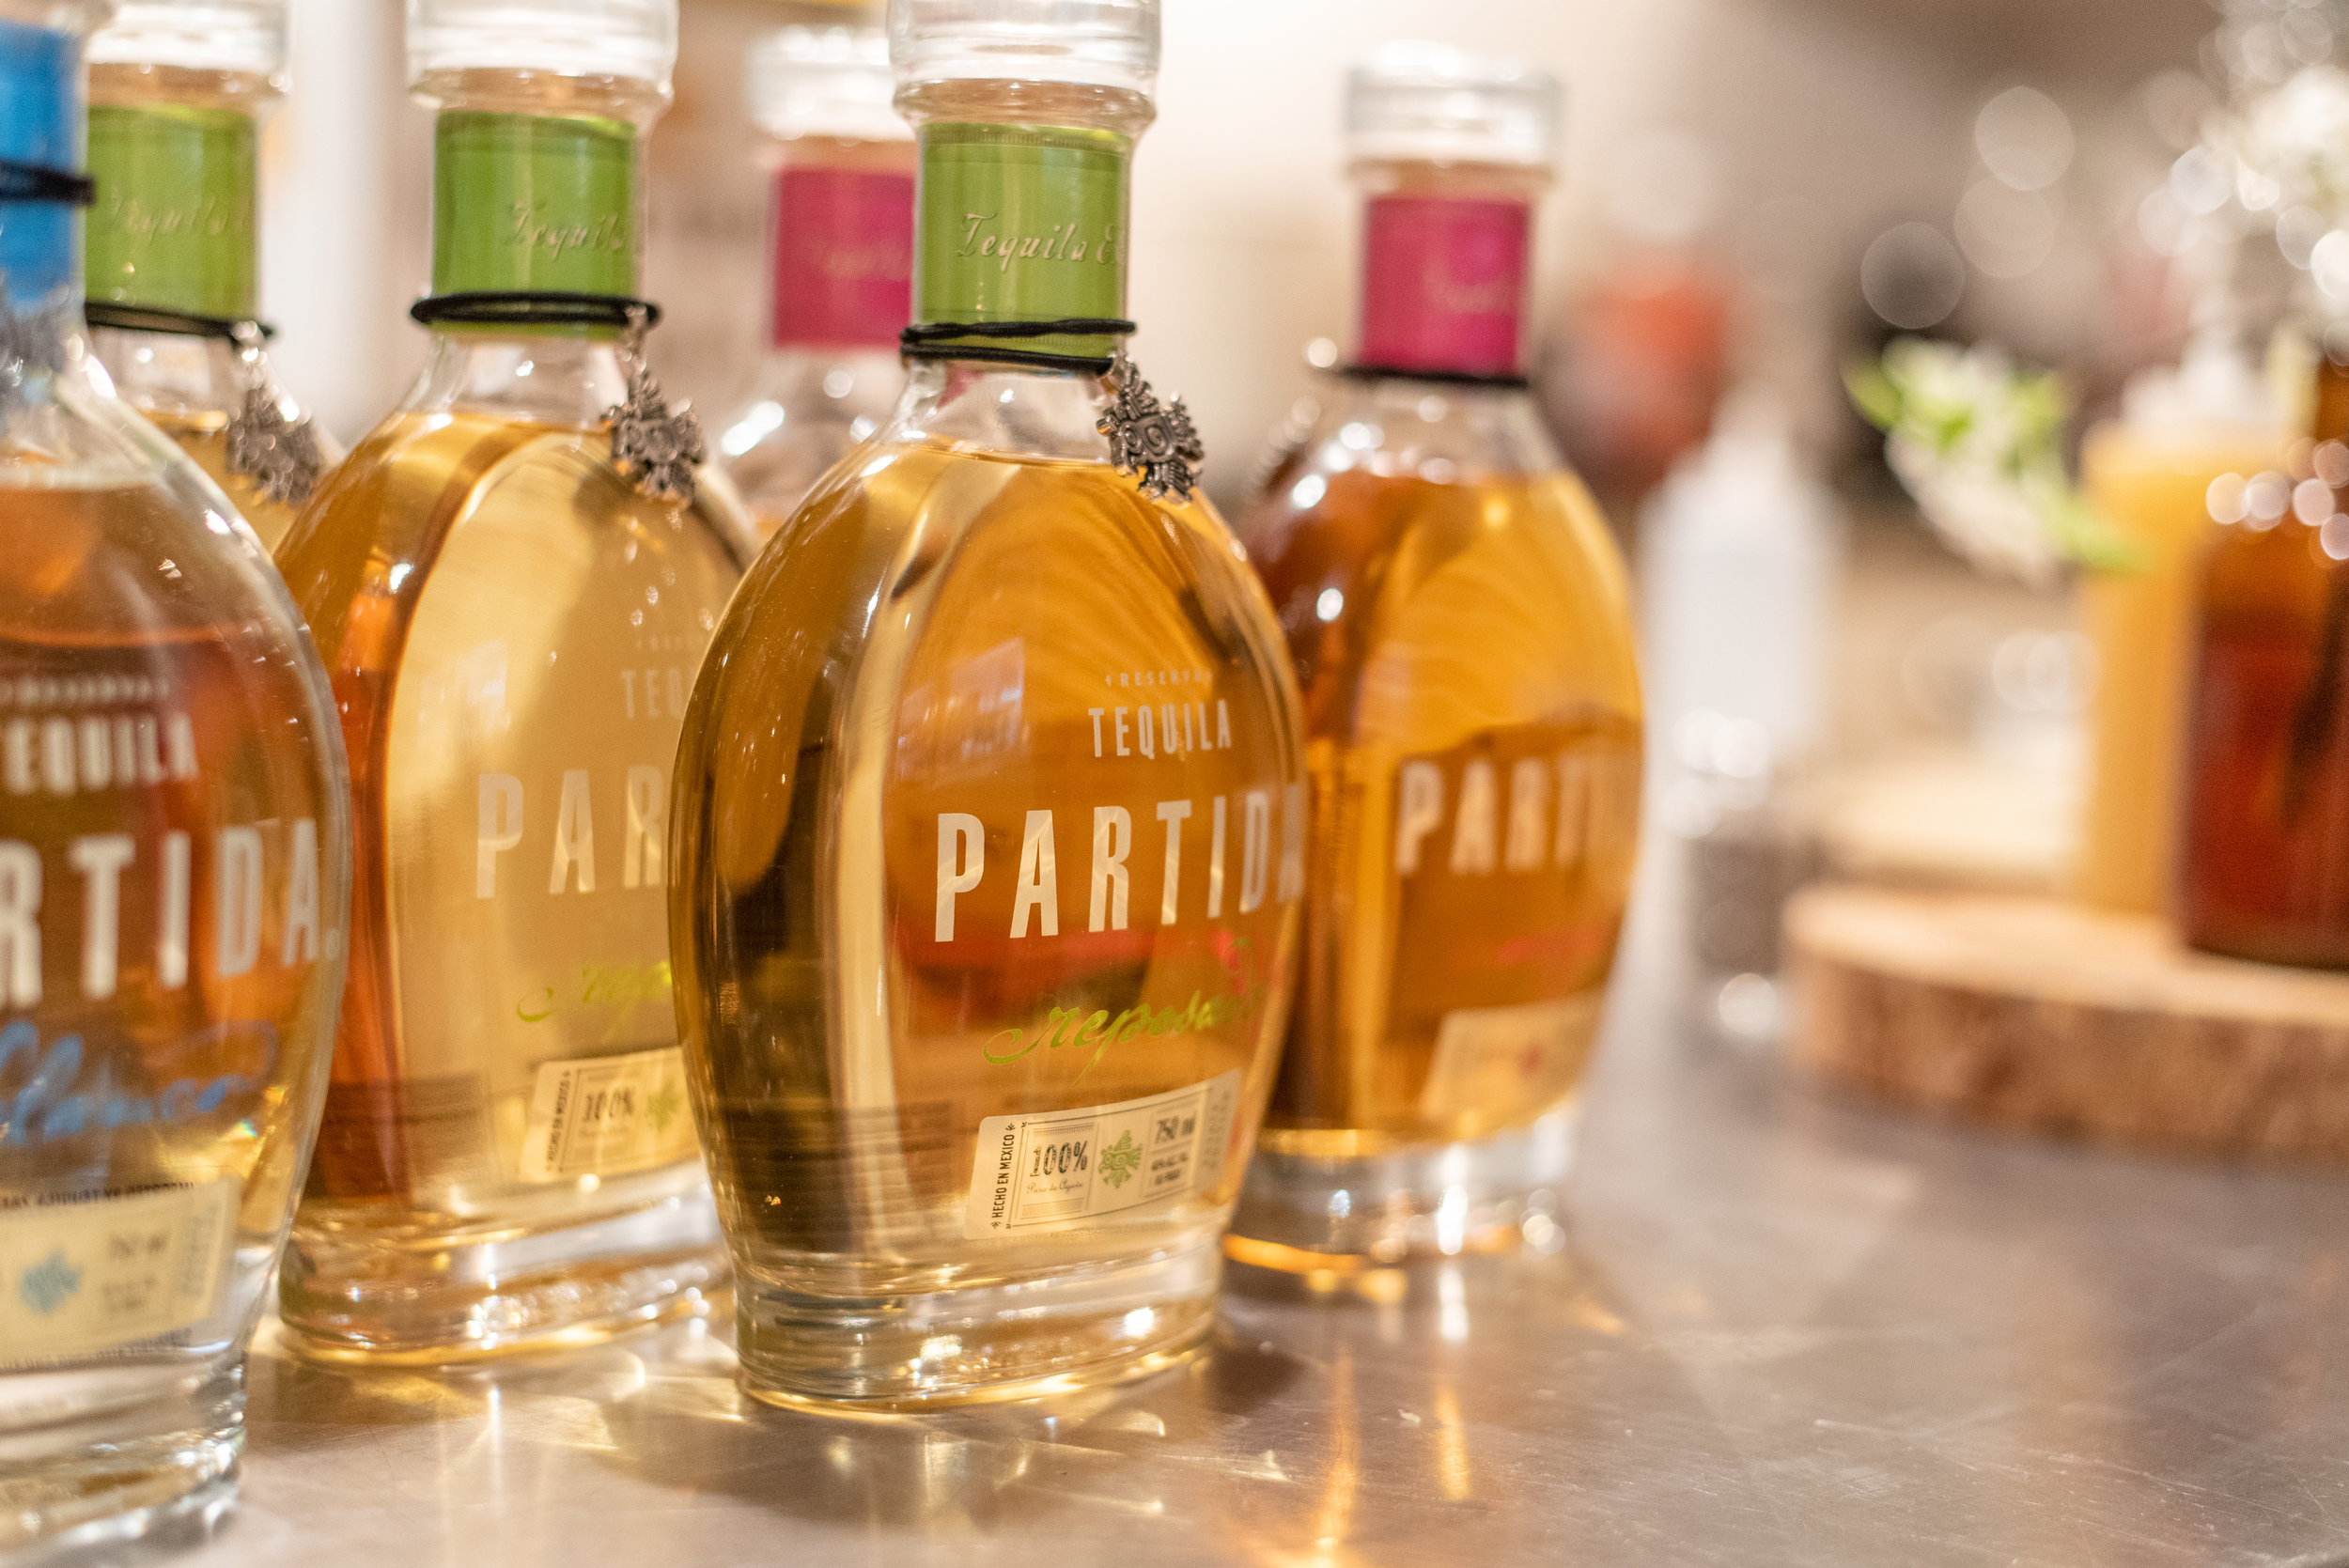 Tequila-Partida-Bottles.jpg